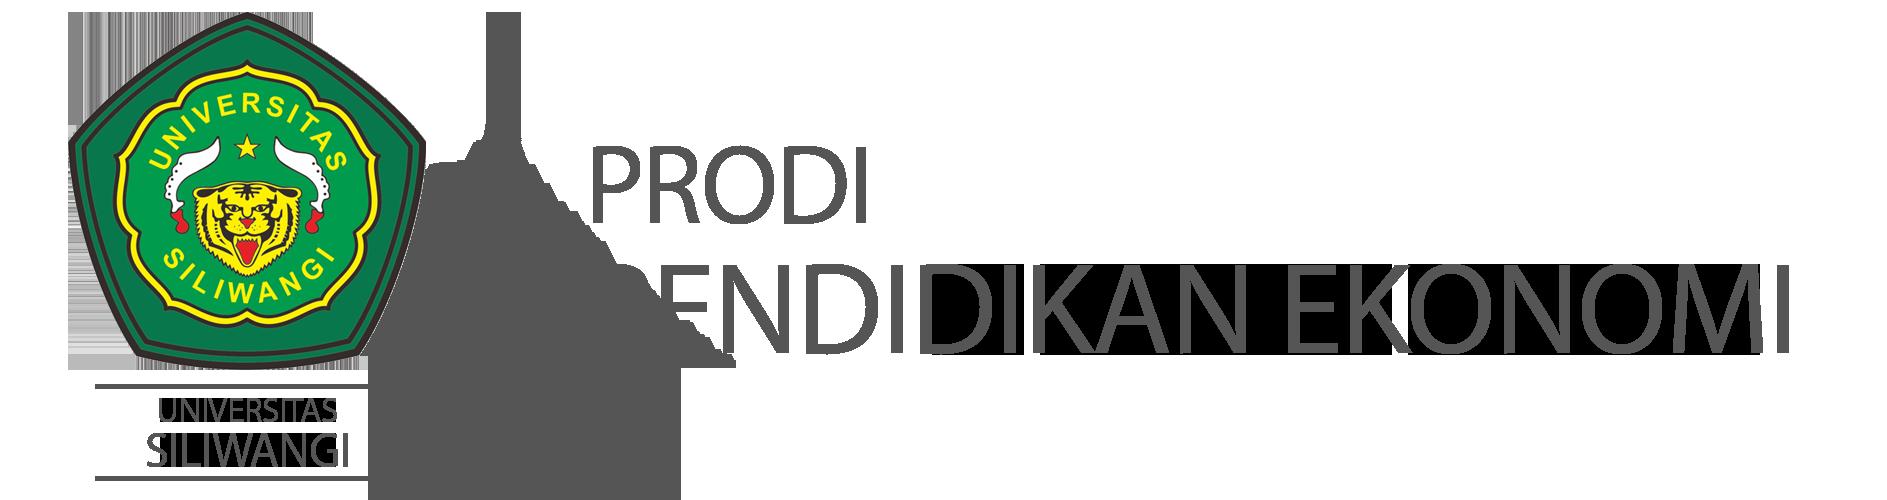 website Resmi Prodi Pendidikan Ekonomi Universitas Siliwangi